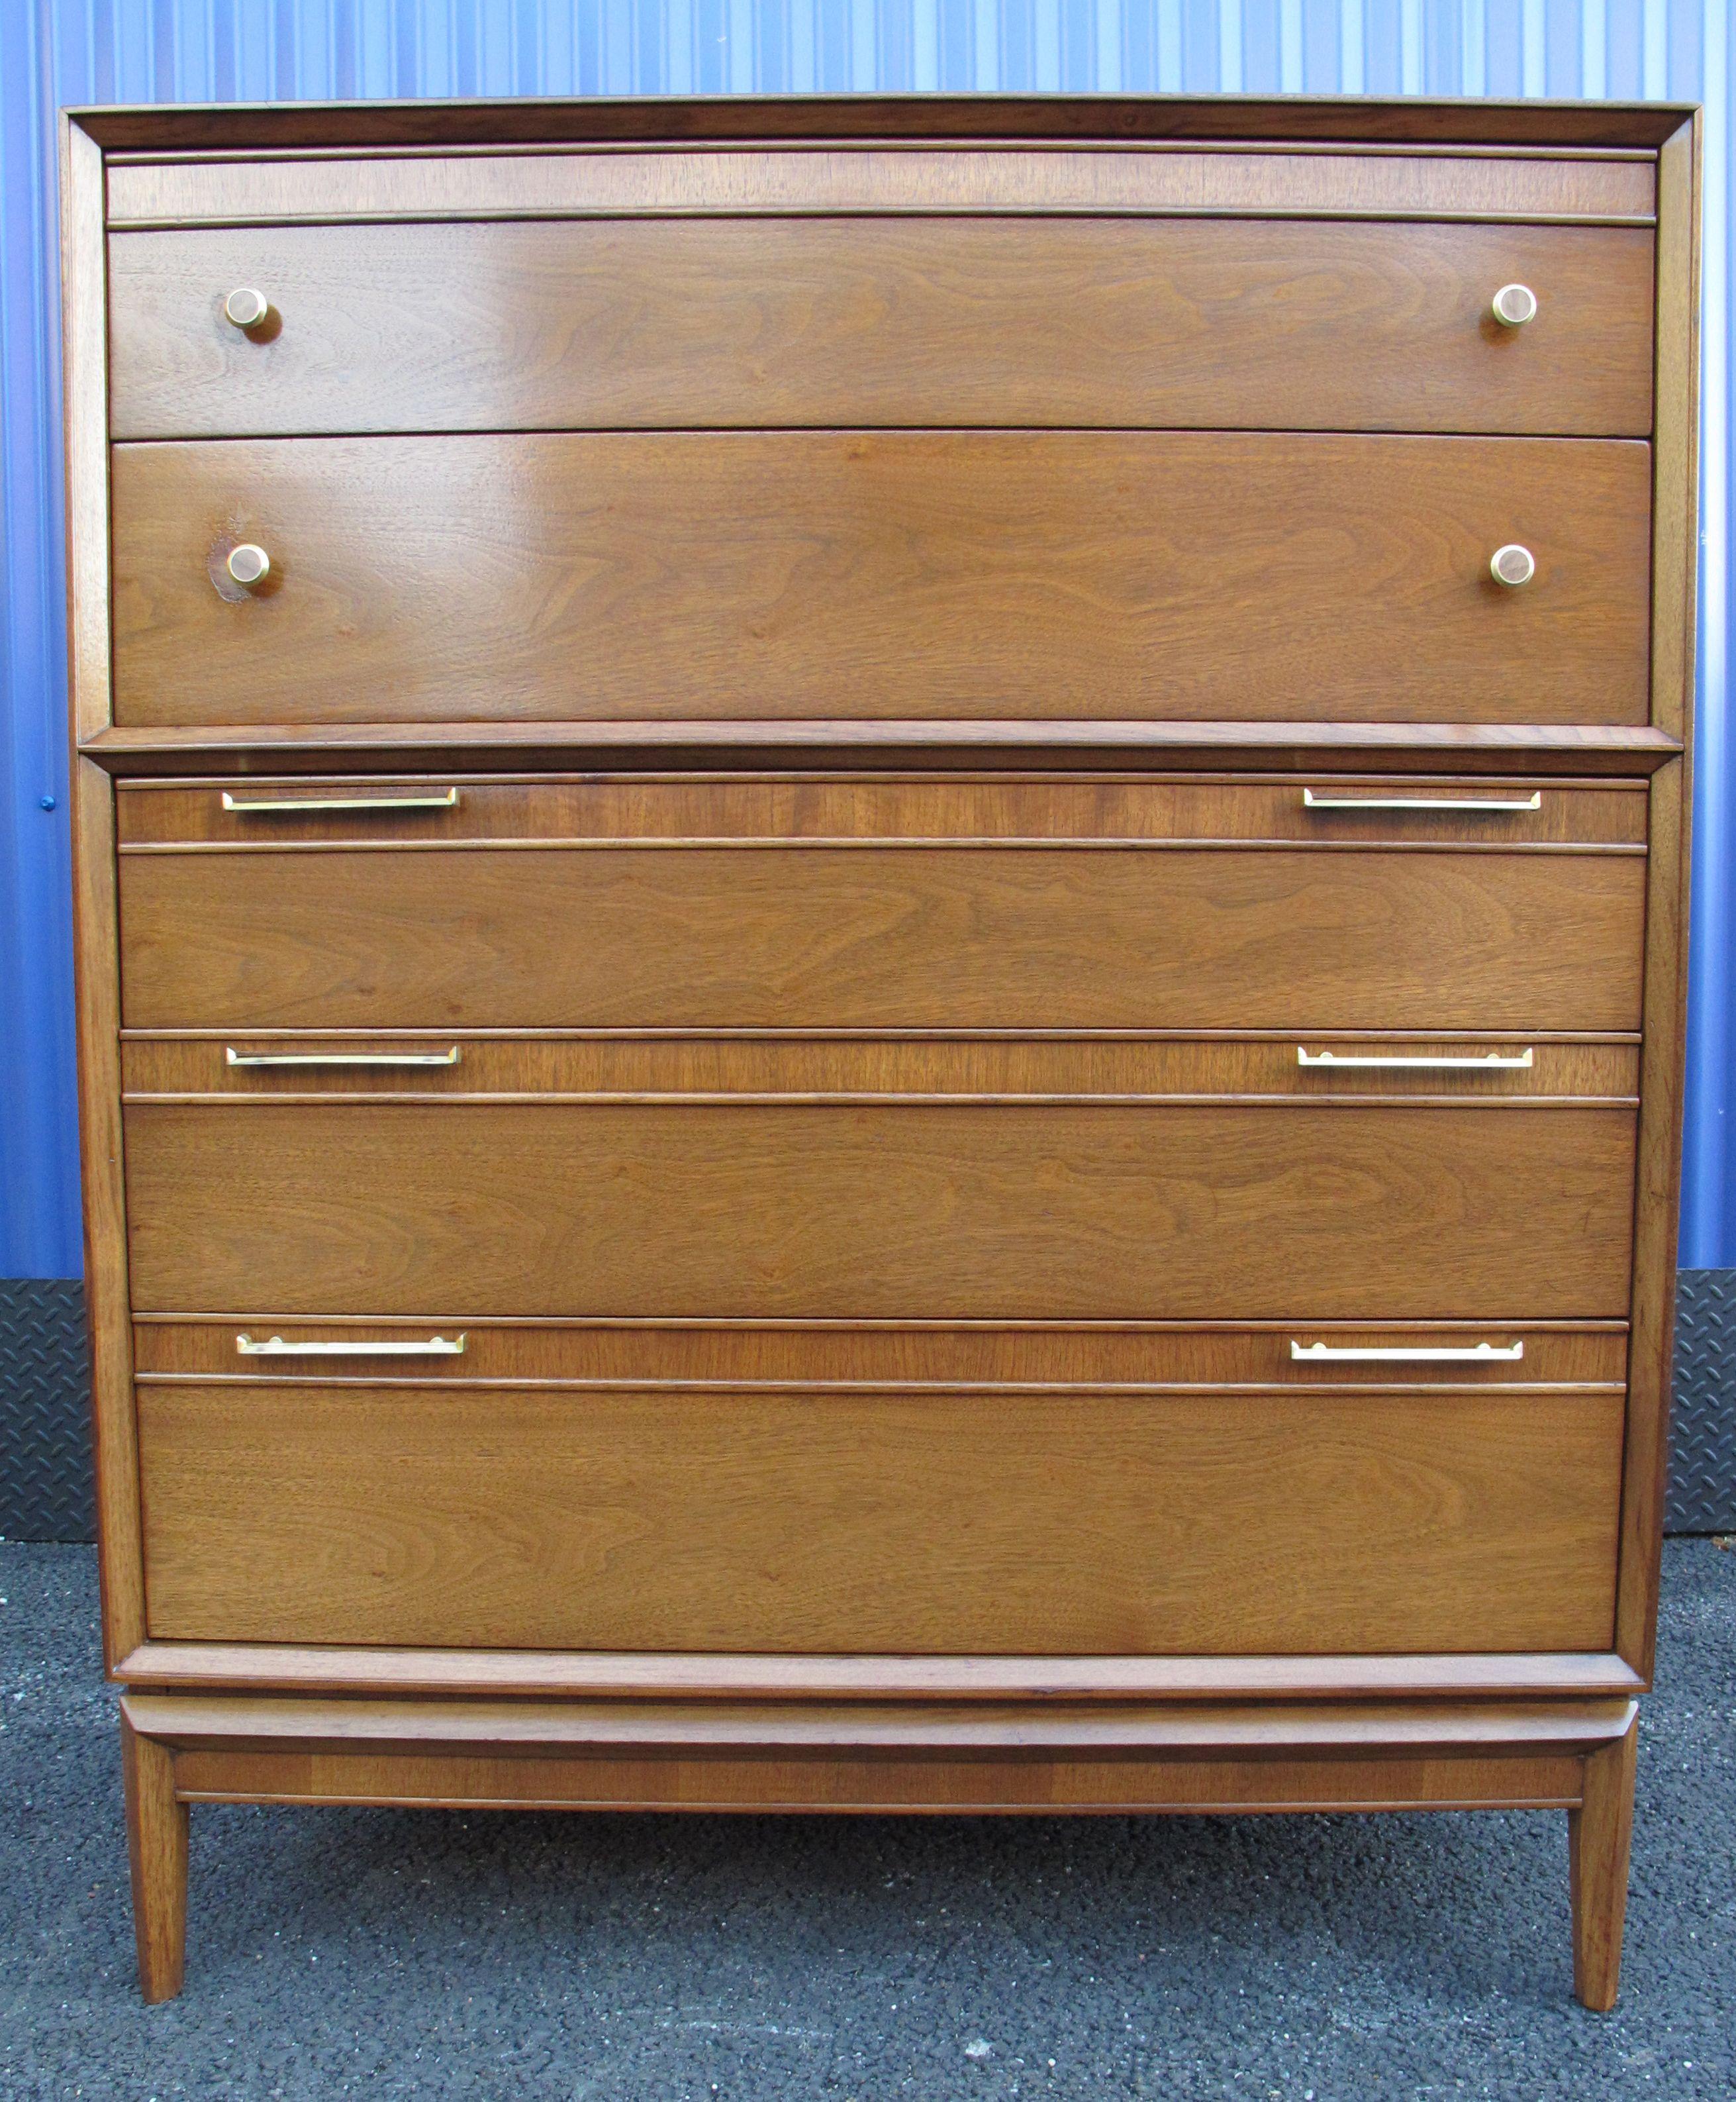 Drexel Pinnacle Tall Dresser C. 1961